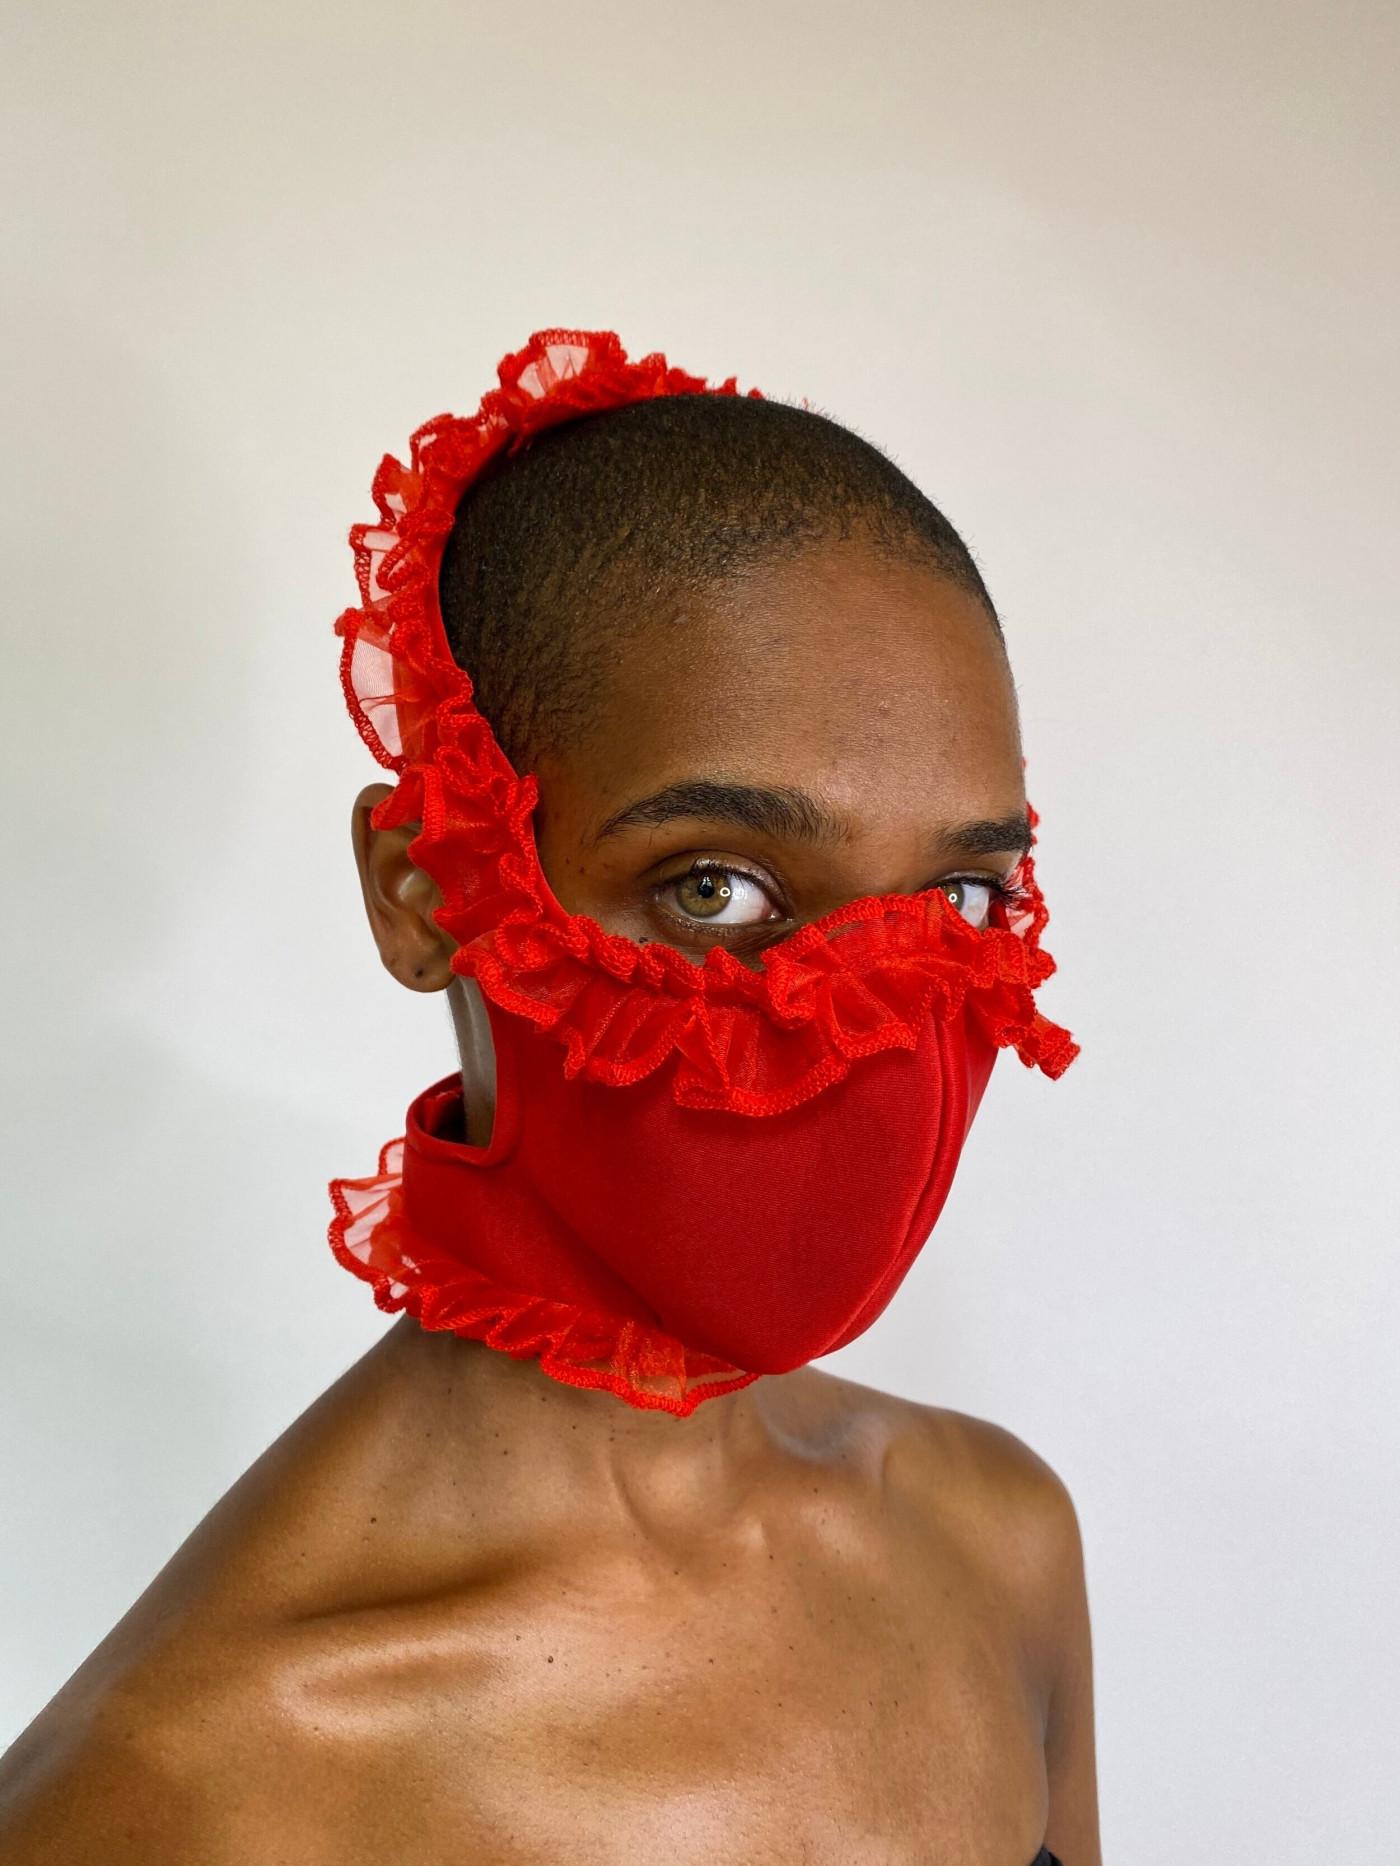 Ruffle Mask by Tia Adeola